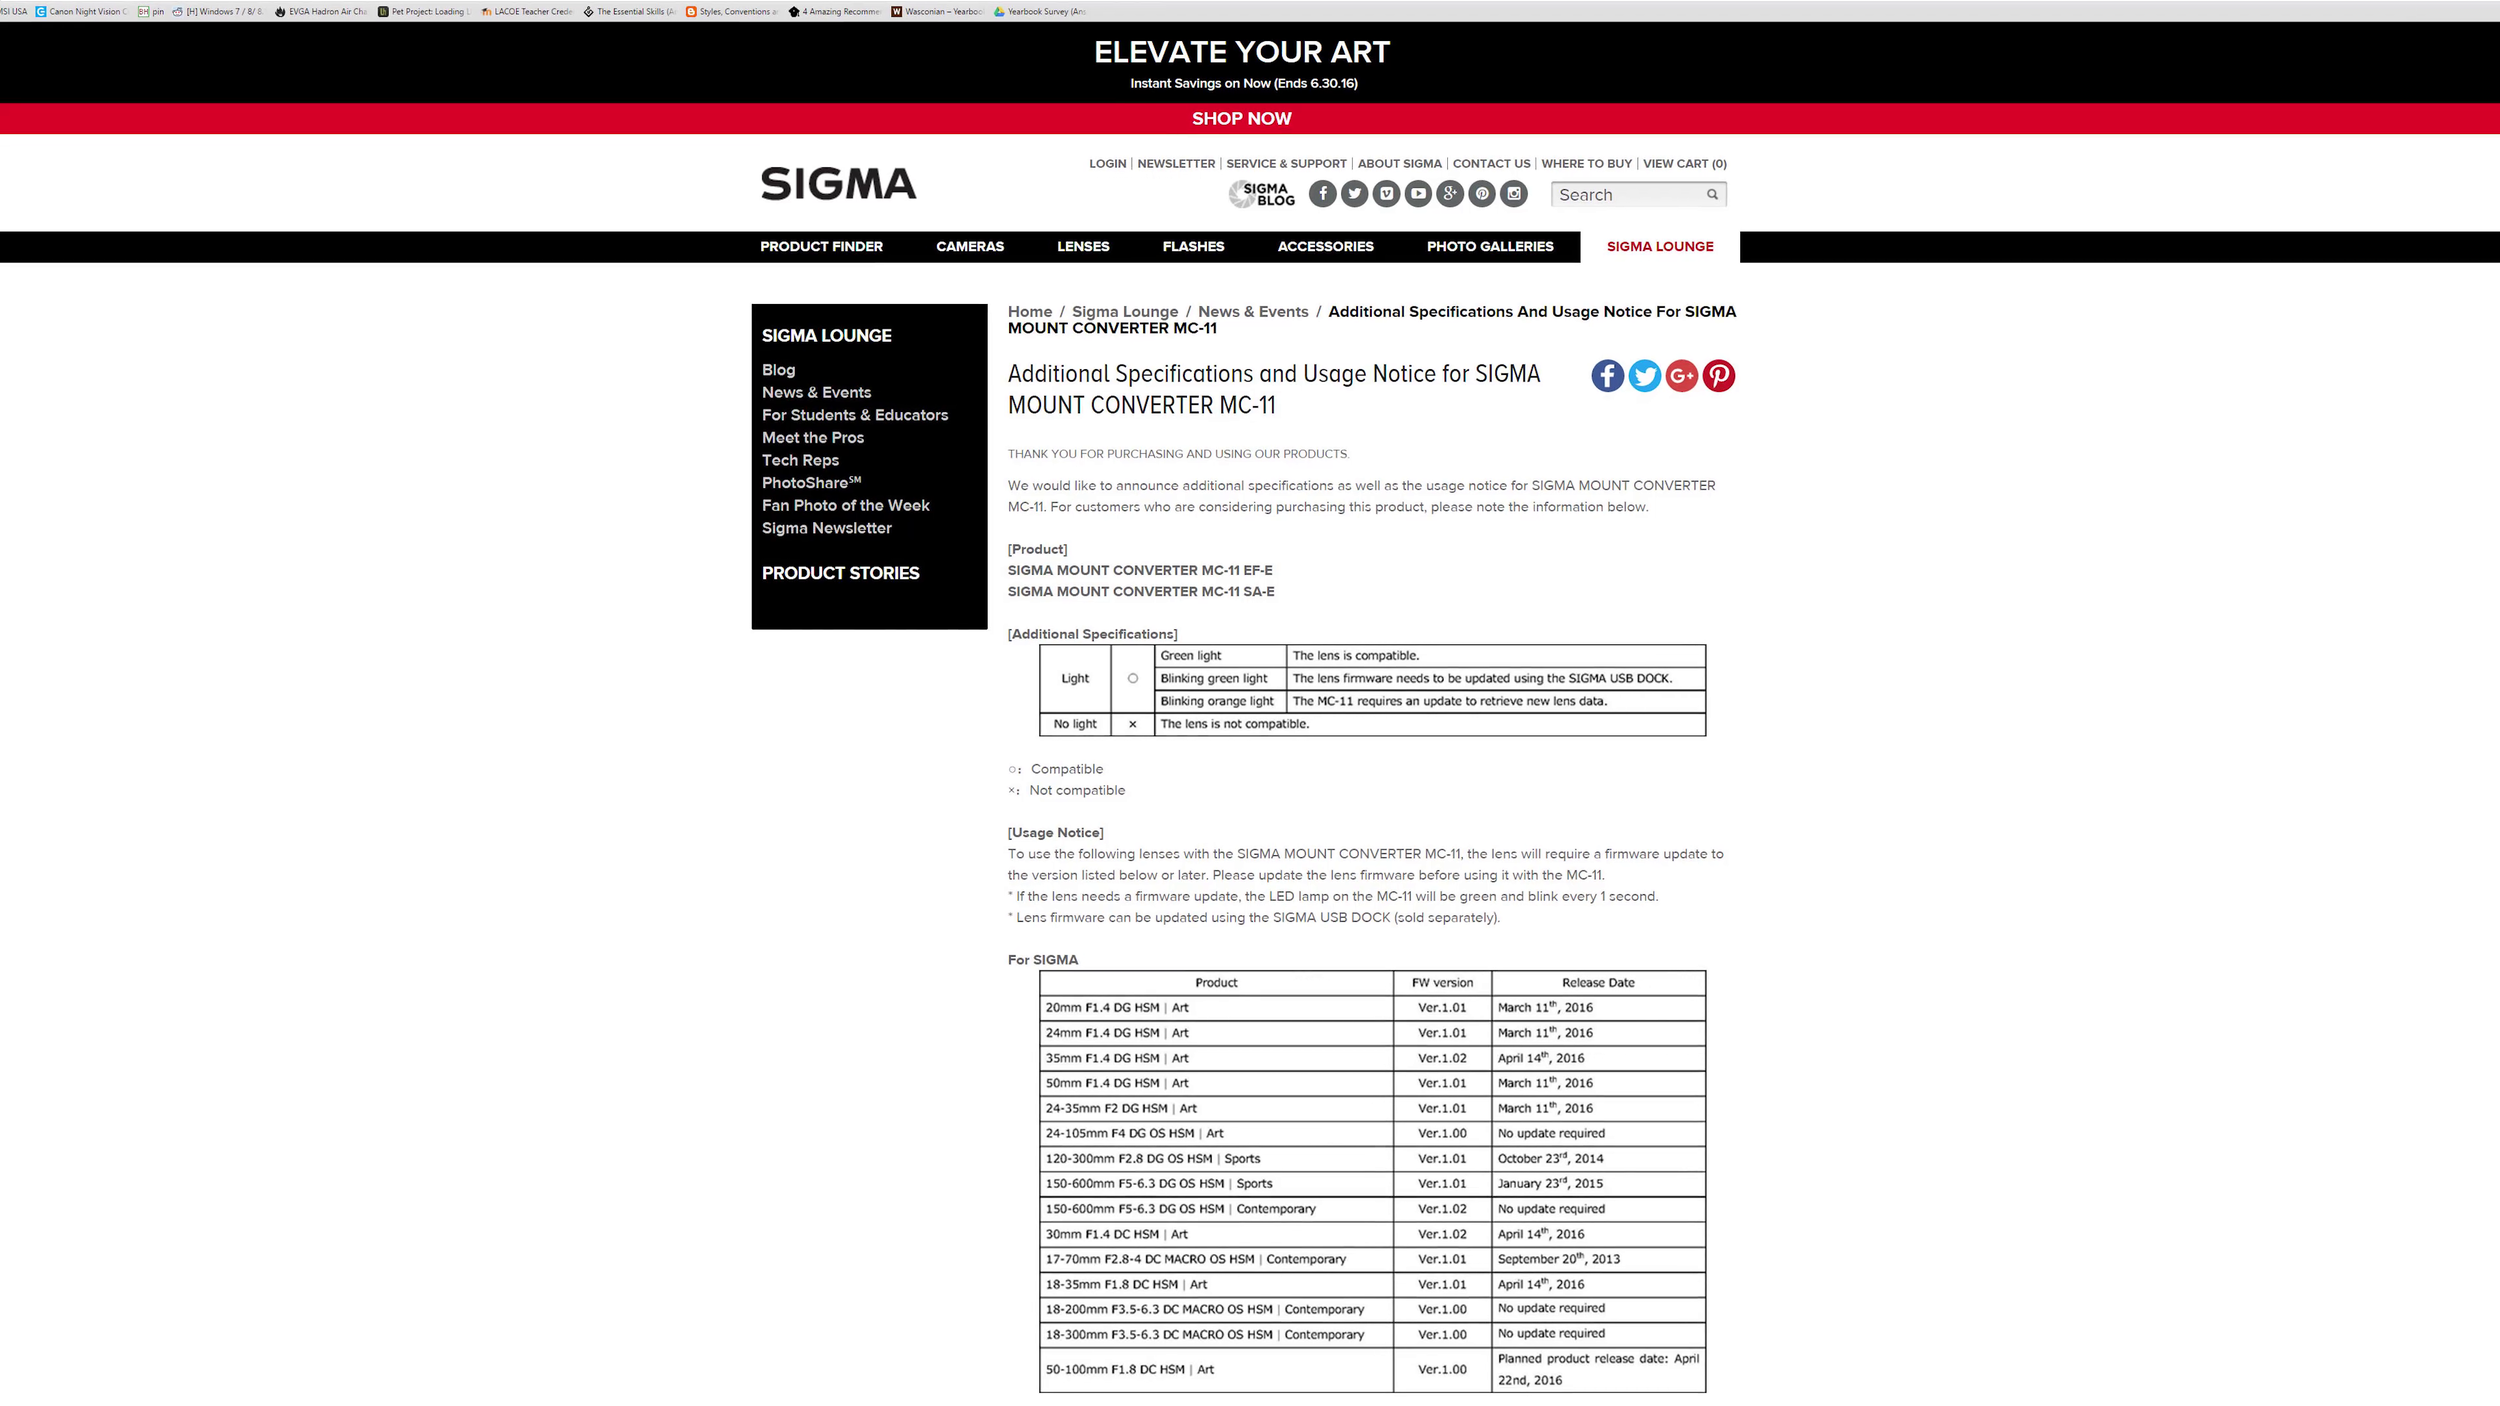 http://www.sigma-global.com/download/en/information.html